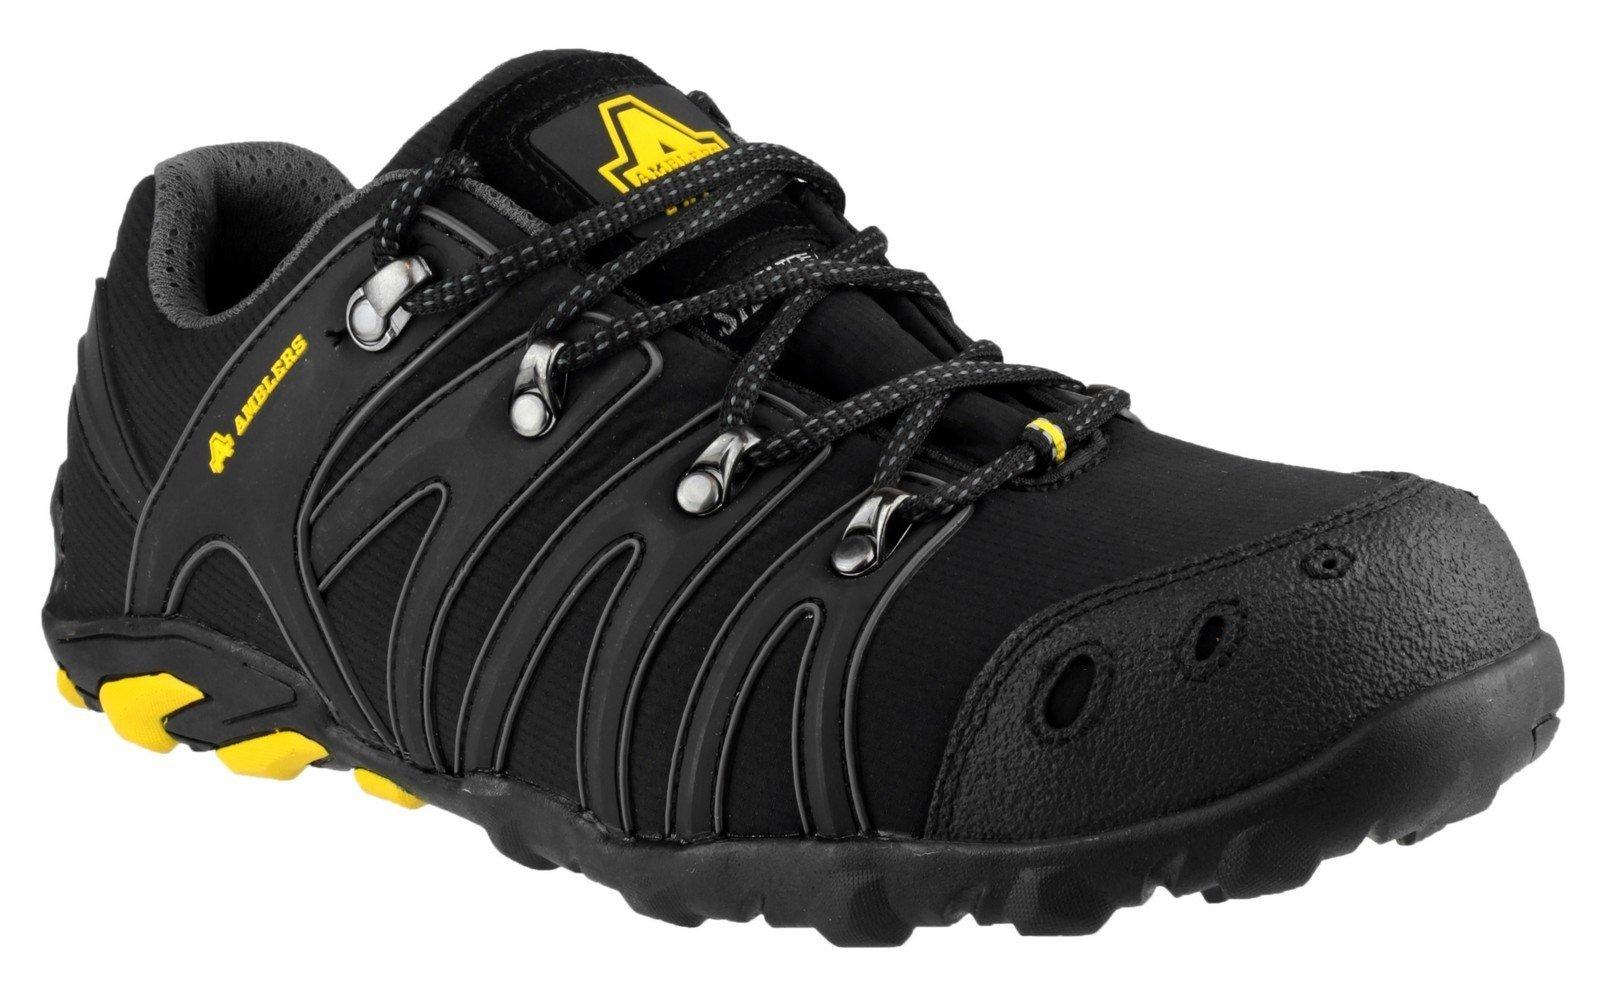 Amblers Unisex Safety Soft Shell Trainer Black - Black 4